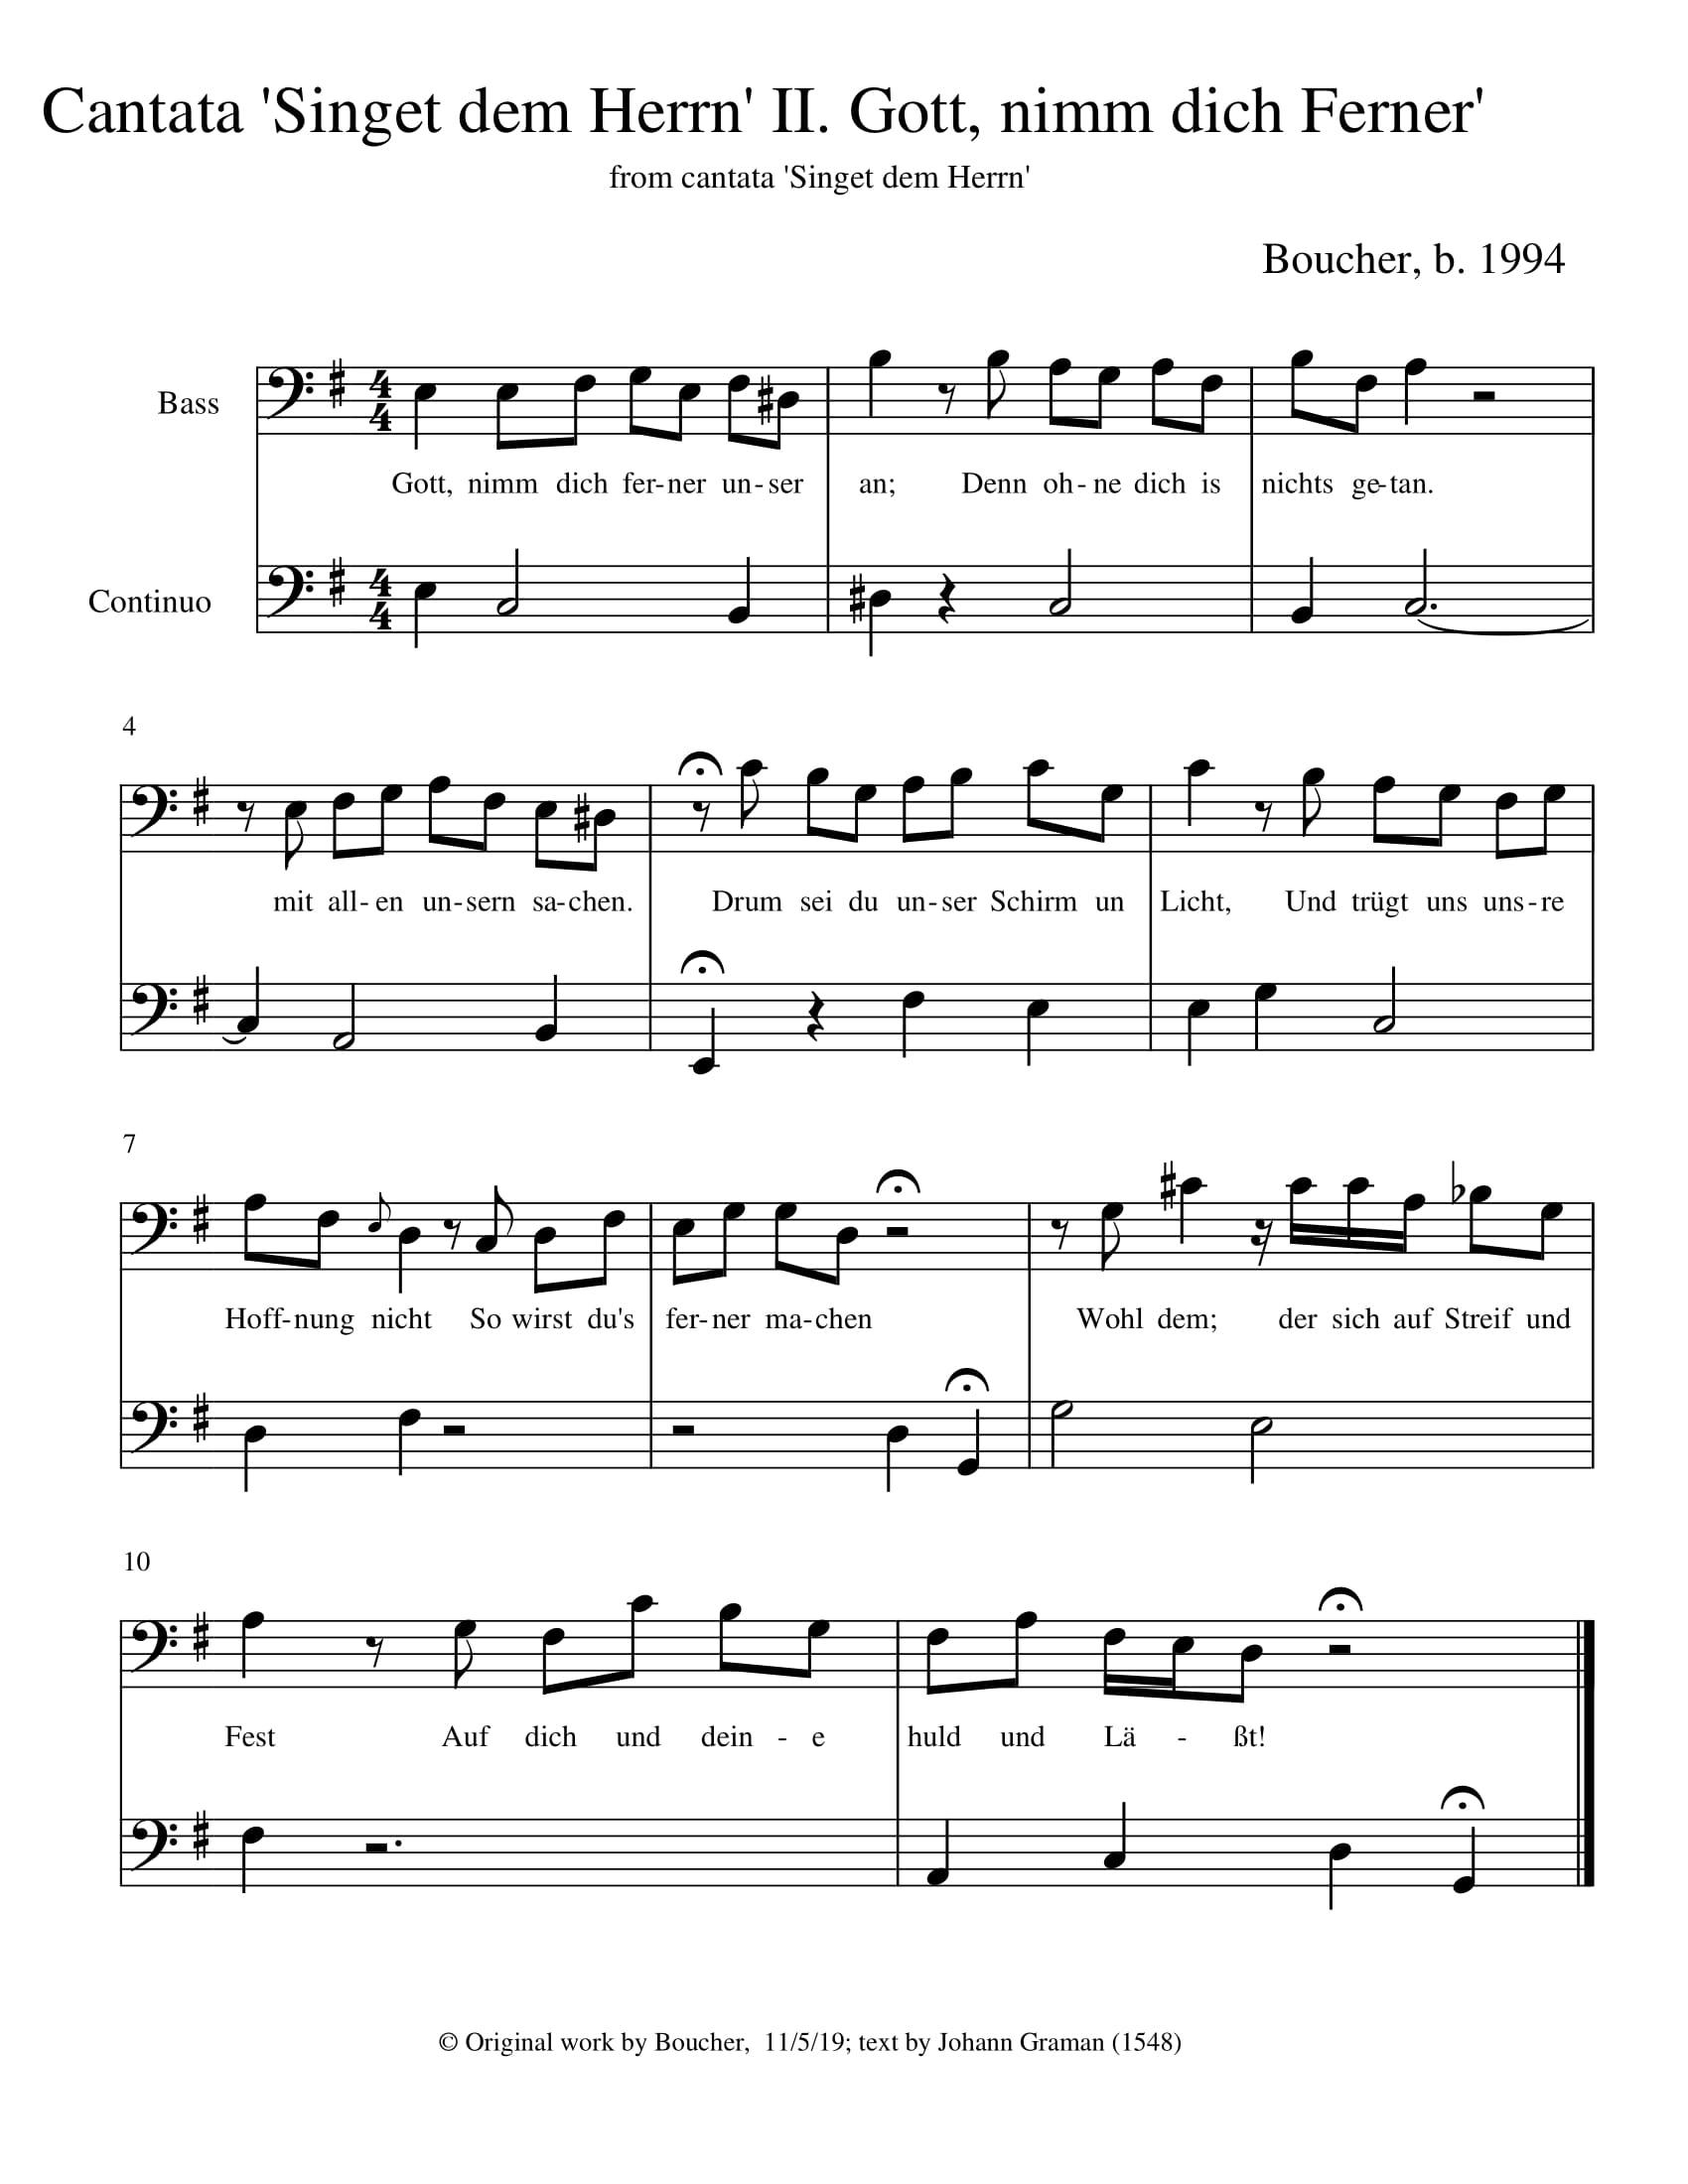 Singet dem Herrn: 2. Recitative